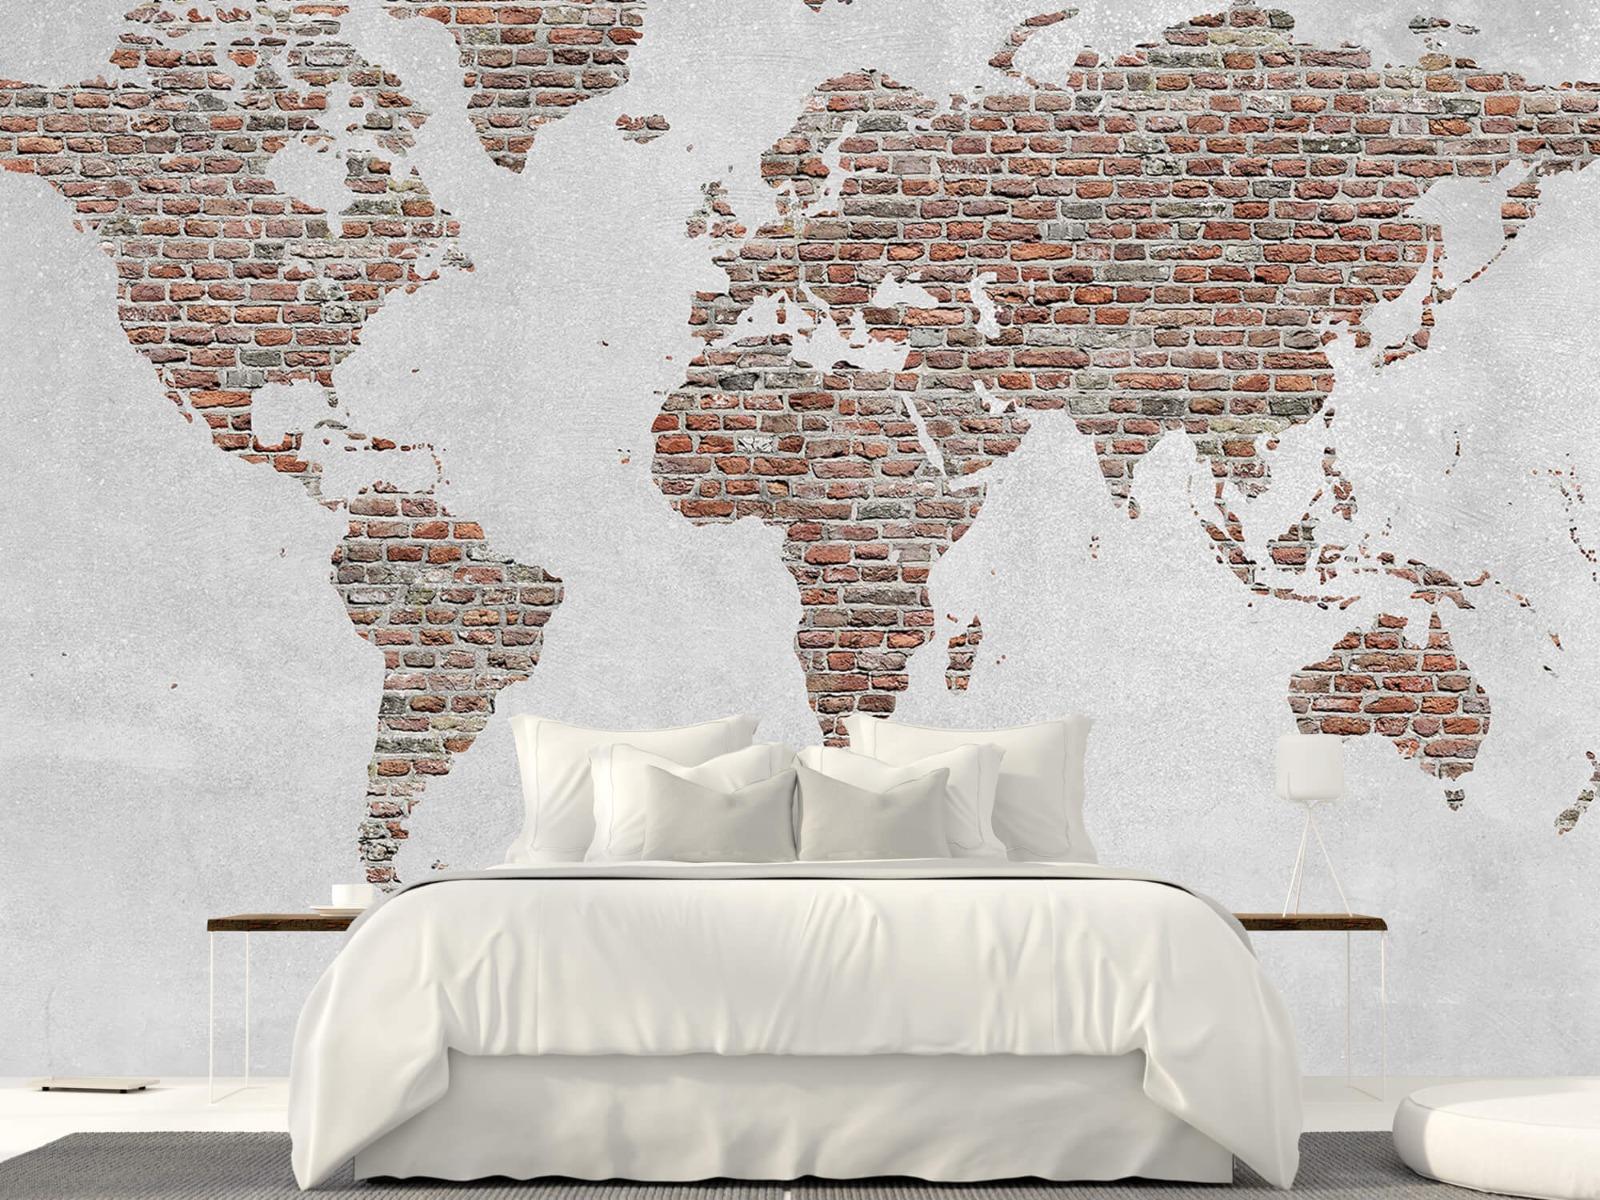 Steen behang - Wereldkaart stenen - Slaapkamer 23